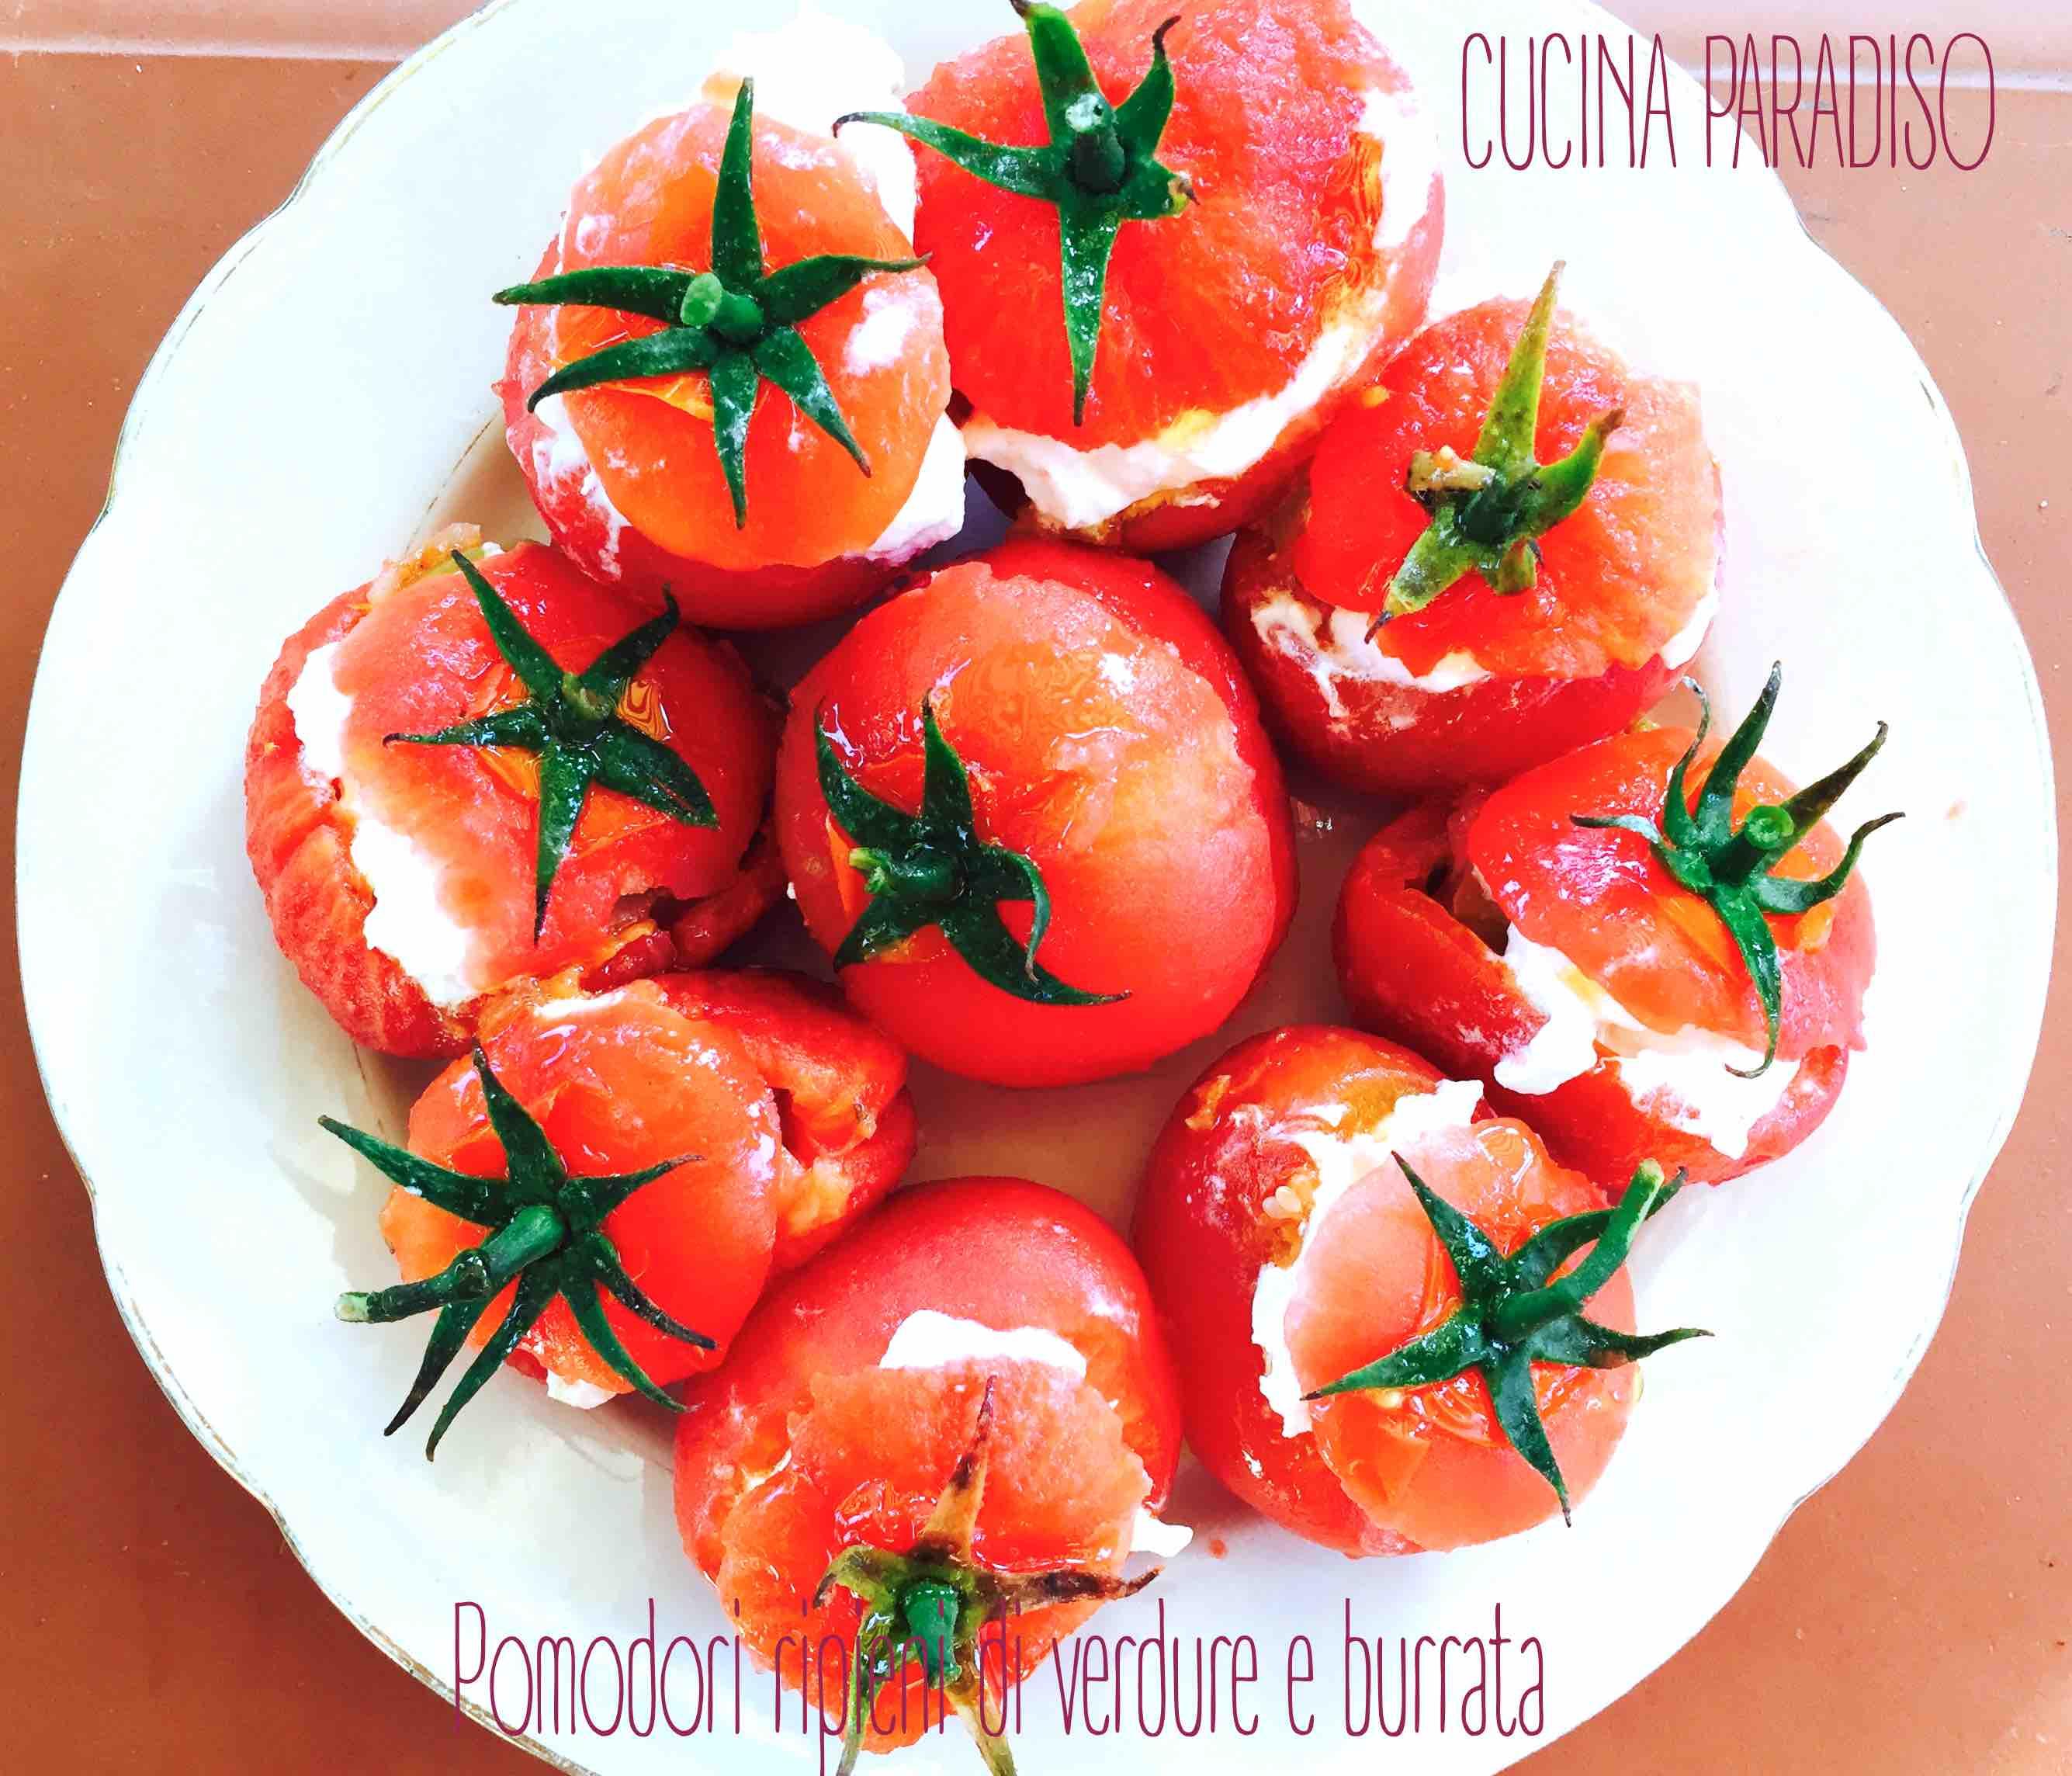 Pomodori ripieni di verdure e burrata2